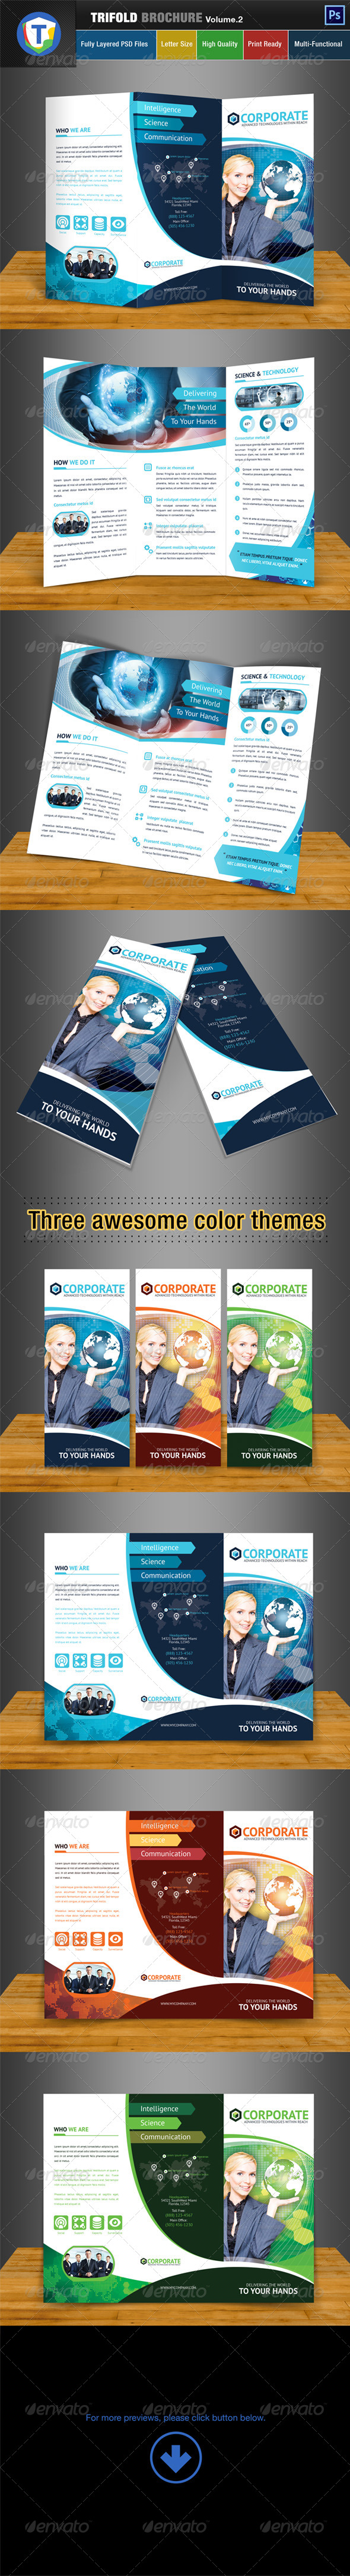 Trifold Brochure - Volume 2 - Brochures Print Templates